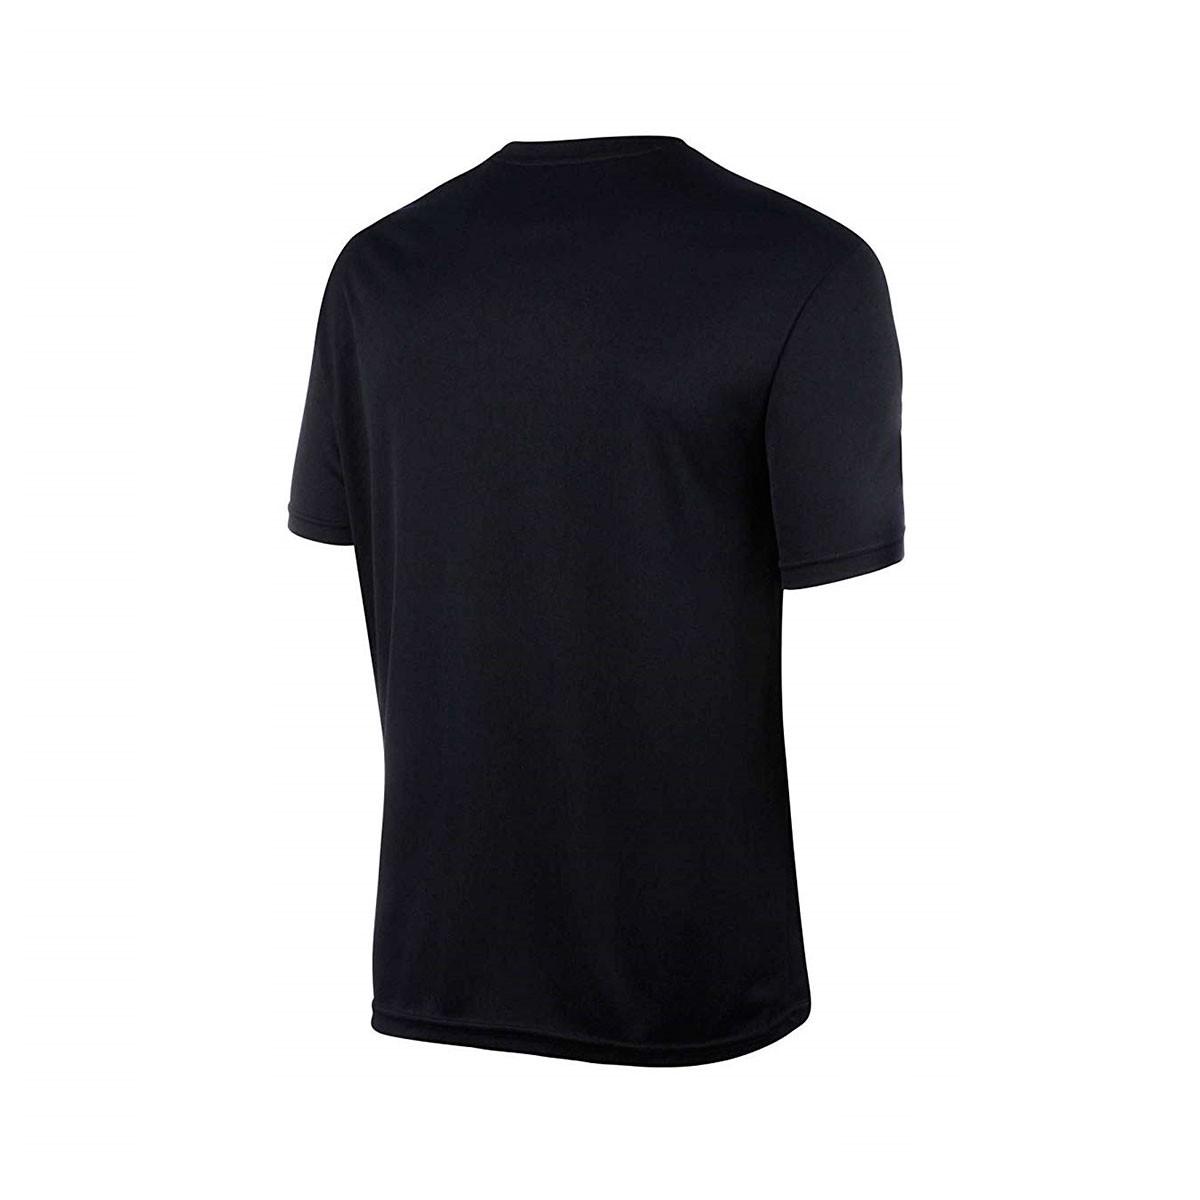 Camiseta Speedo Interlock Canoa Feminino Preto